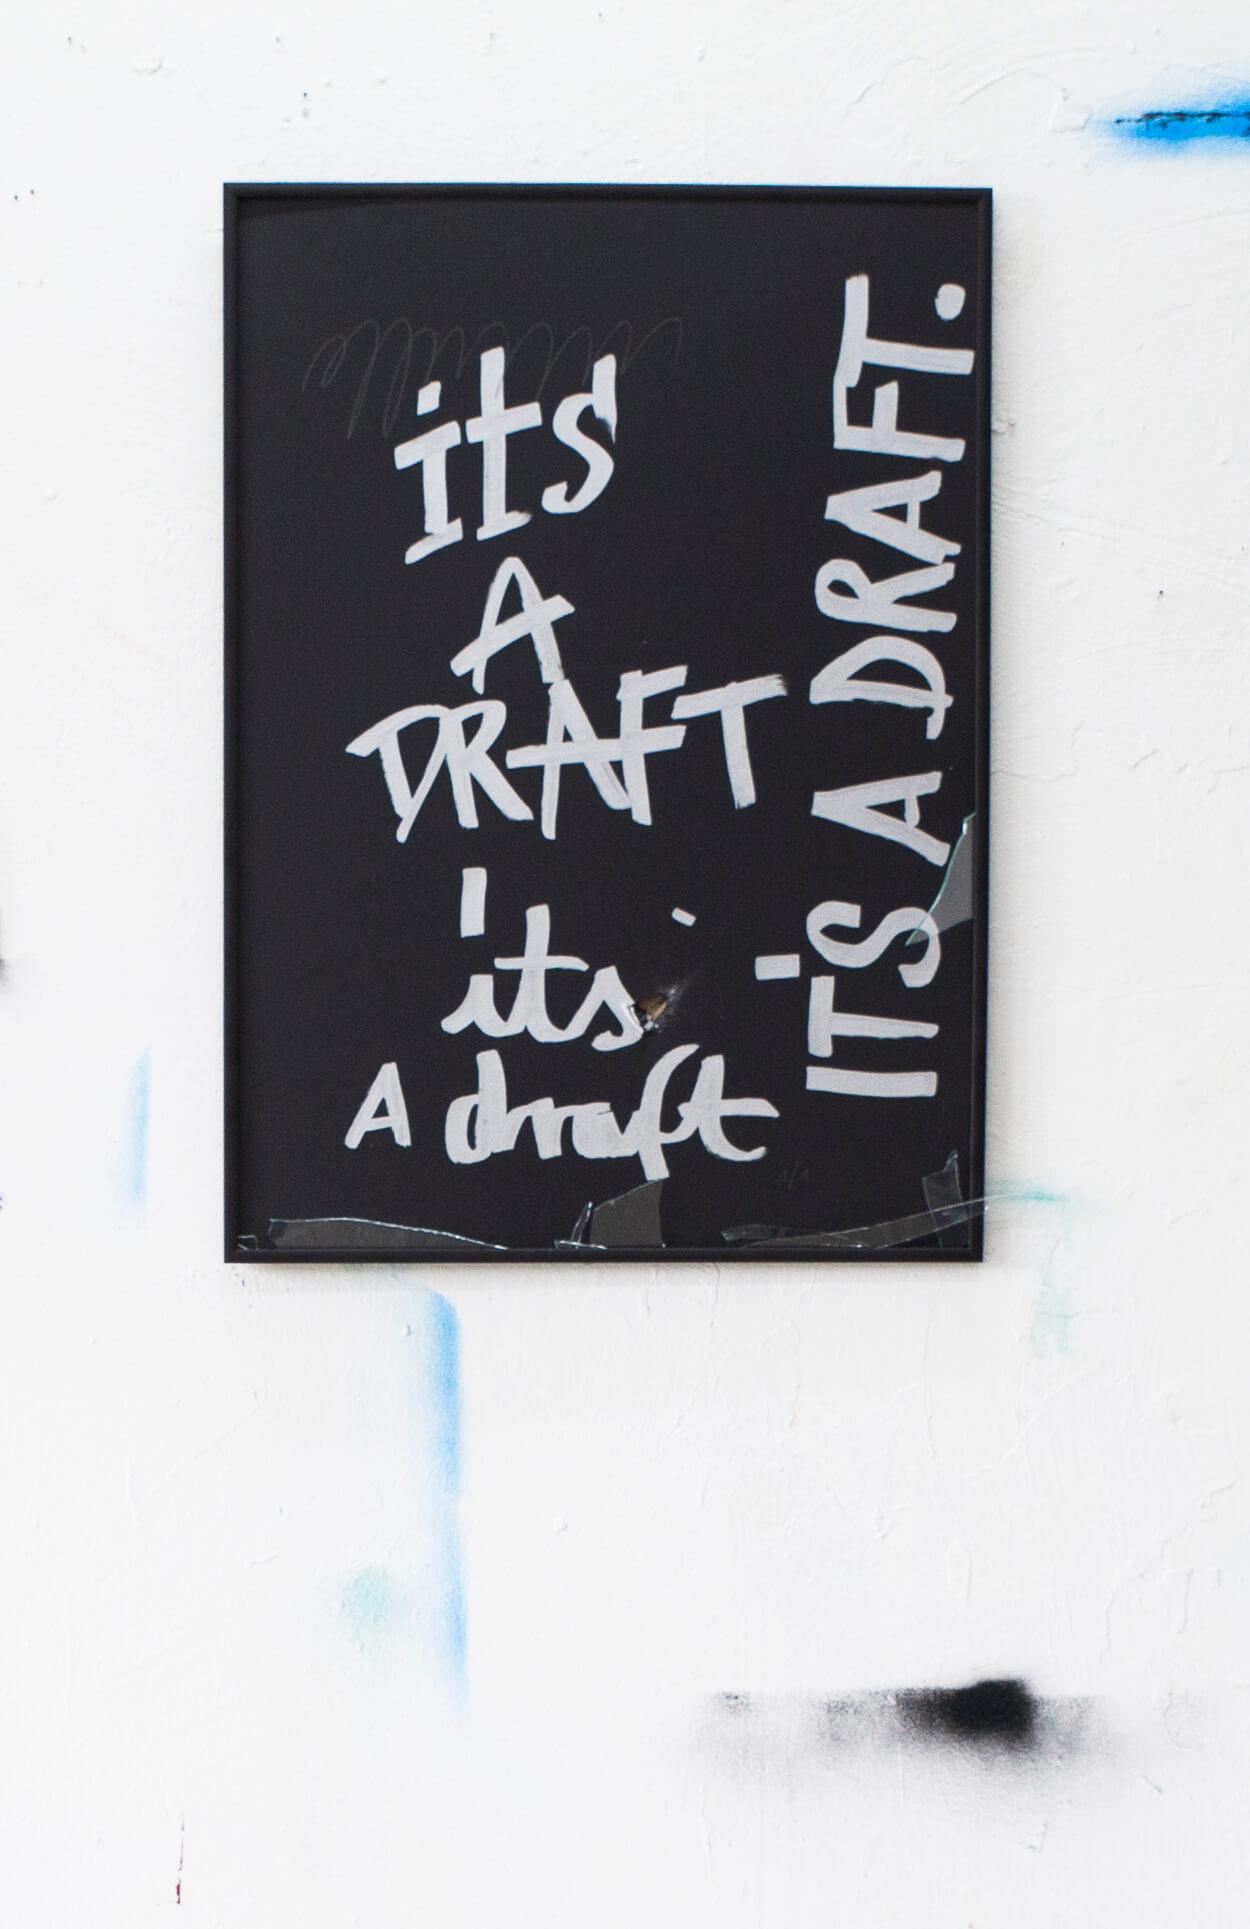 Daniel_Angermann_its_a_draft_20 It's a draft